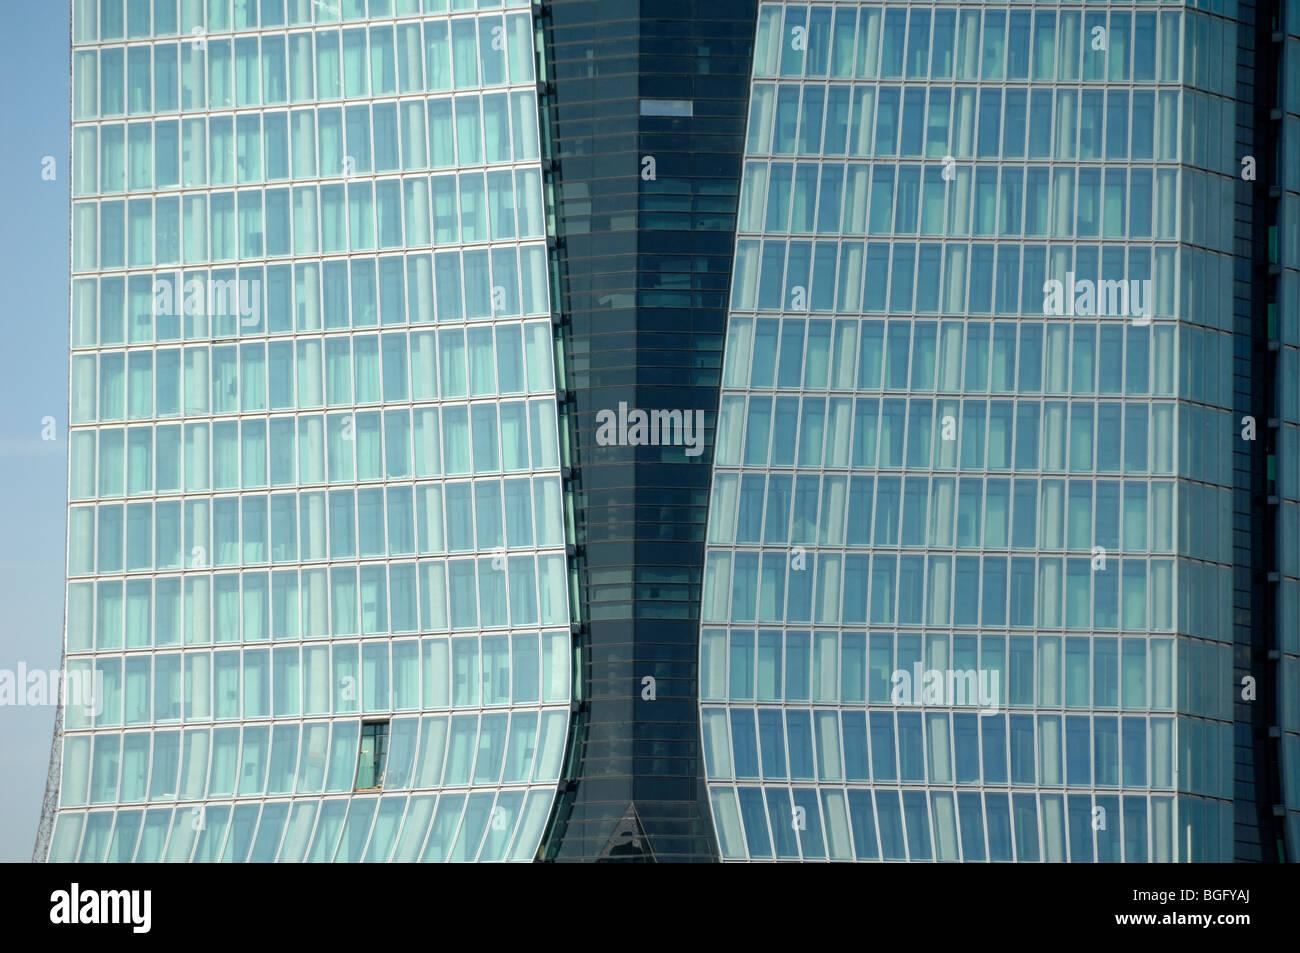 Glass & Steel Facade of the CGM Office Block Tower by Zaha Hadid, La Joliette Docks, Marseille or Marseilles, - Stock Image